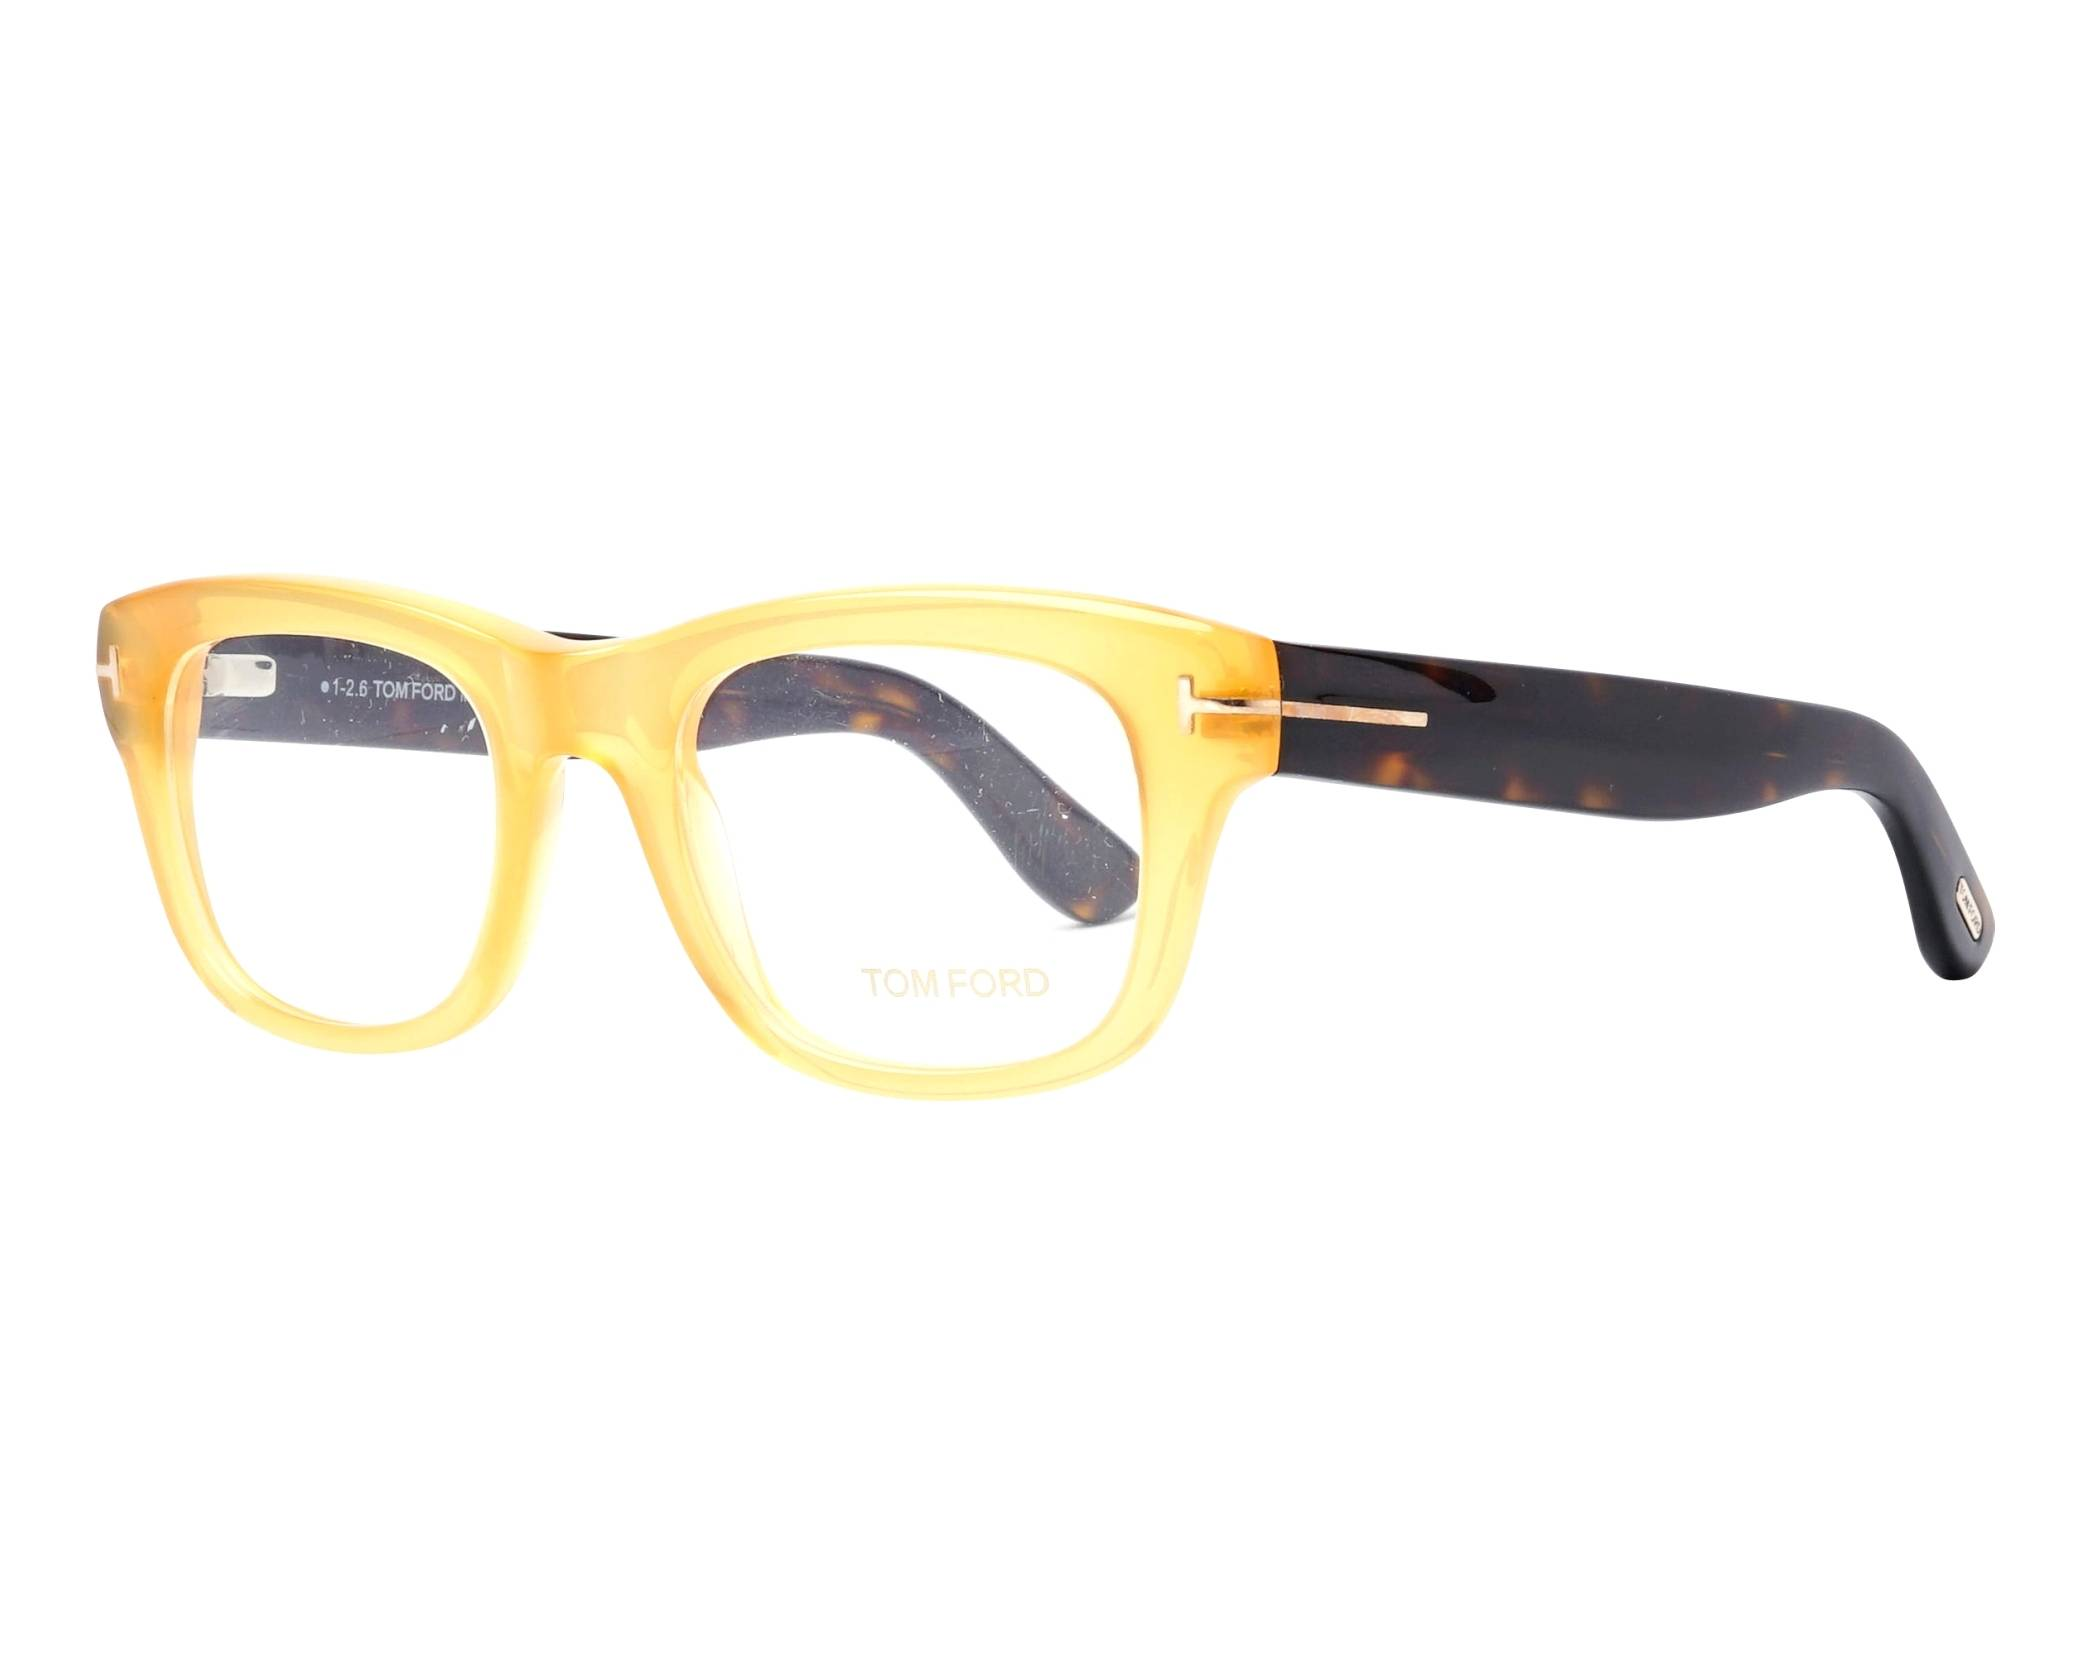 de4a56f6a1394 eyeglasses Tom Ford FT-5472 039 49-20 Yellow Havana profile view